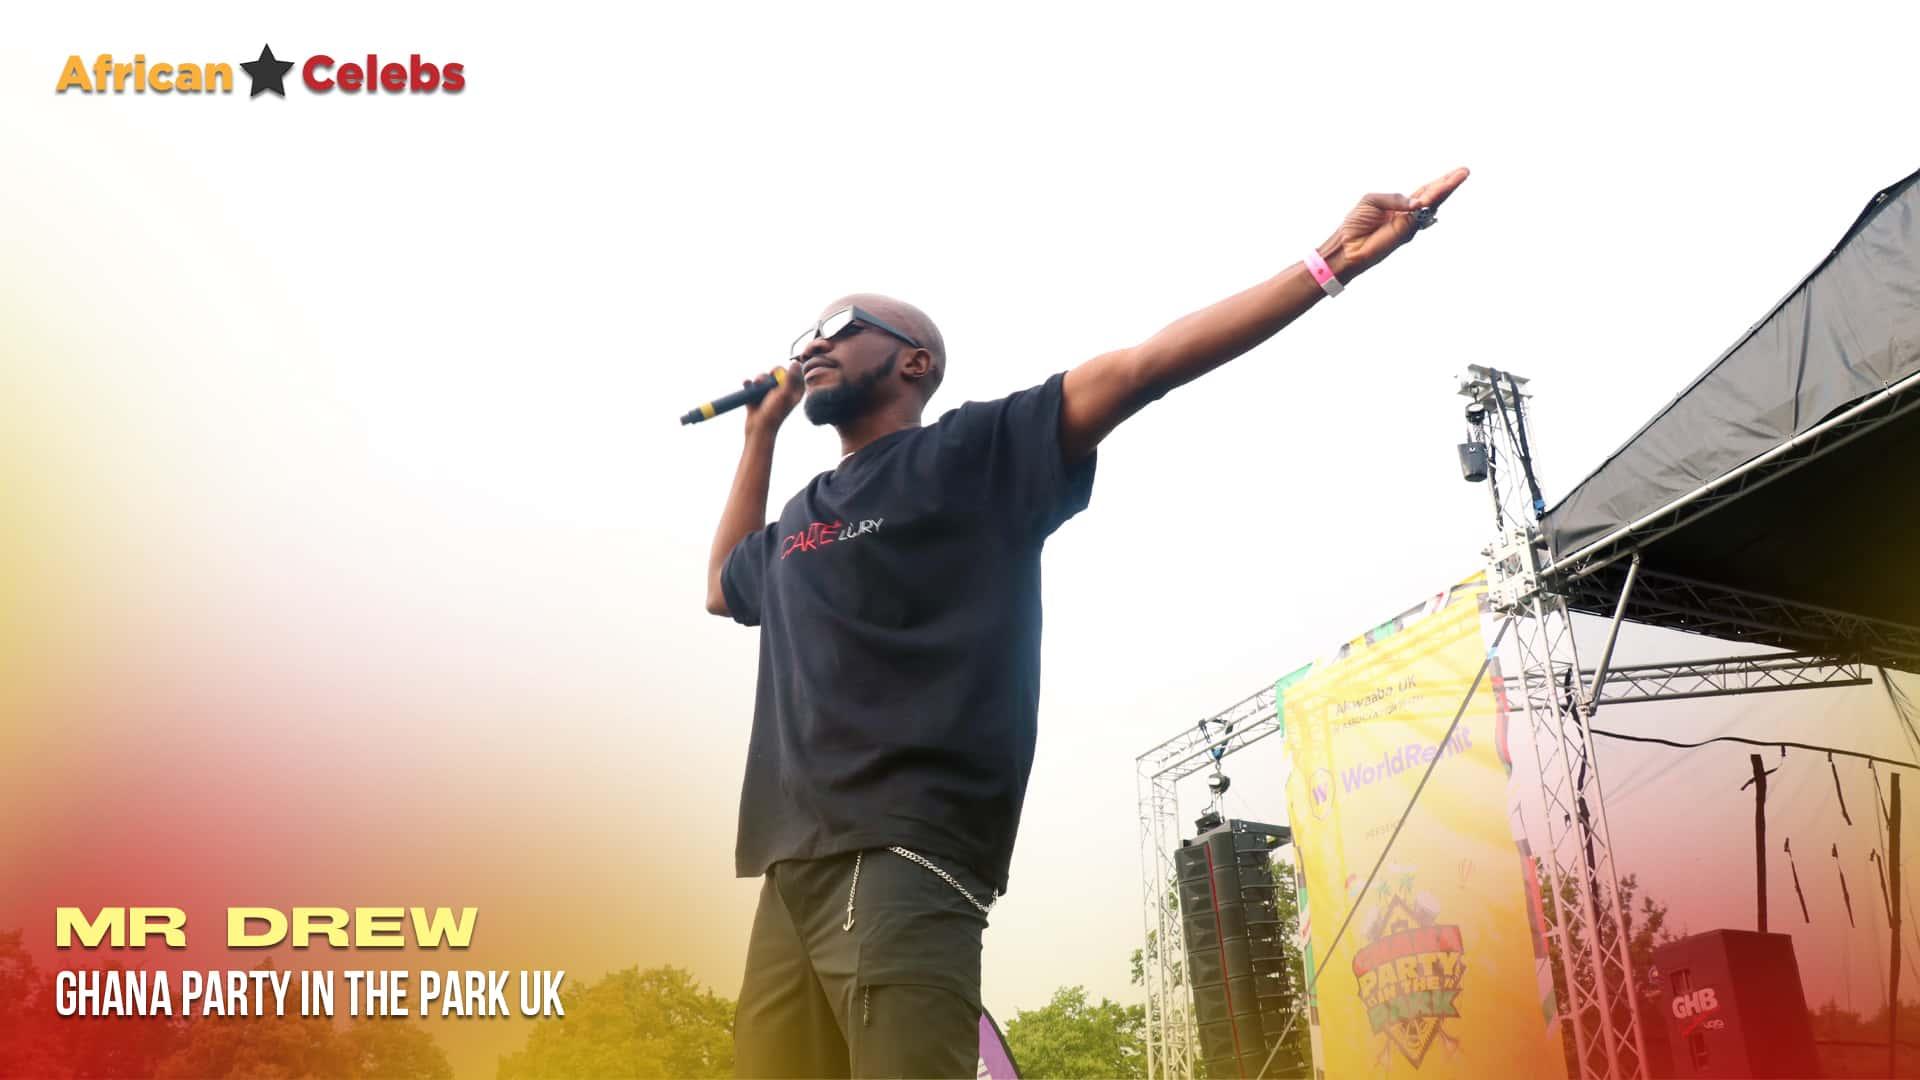 Ghana party in the park -  Mr Drew ceek.com